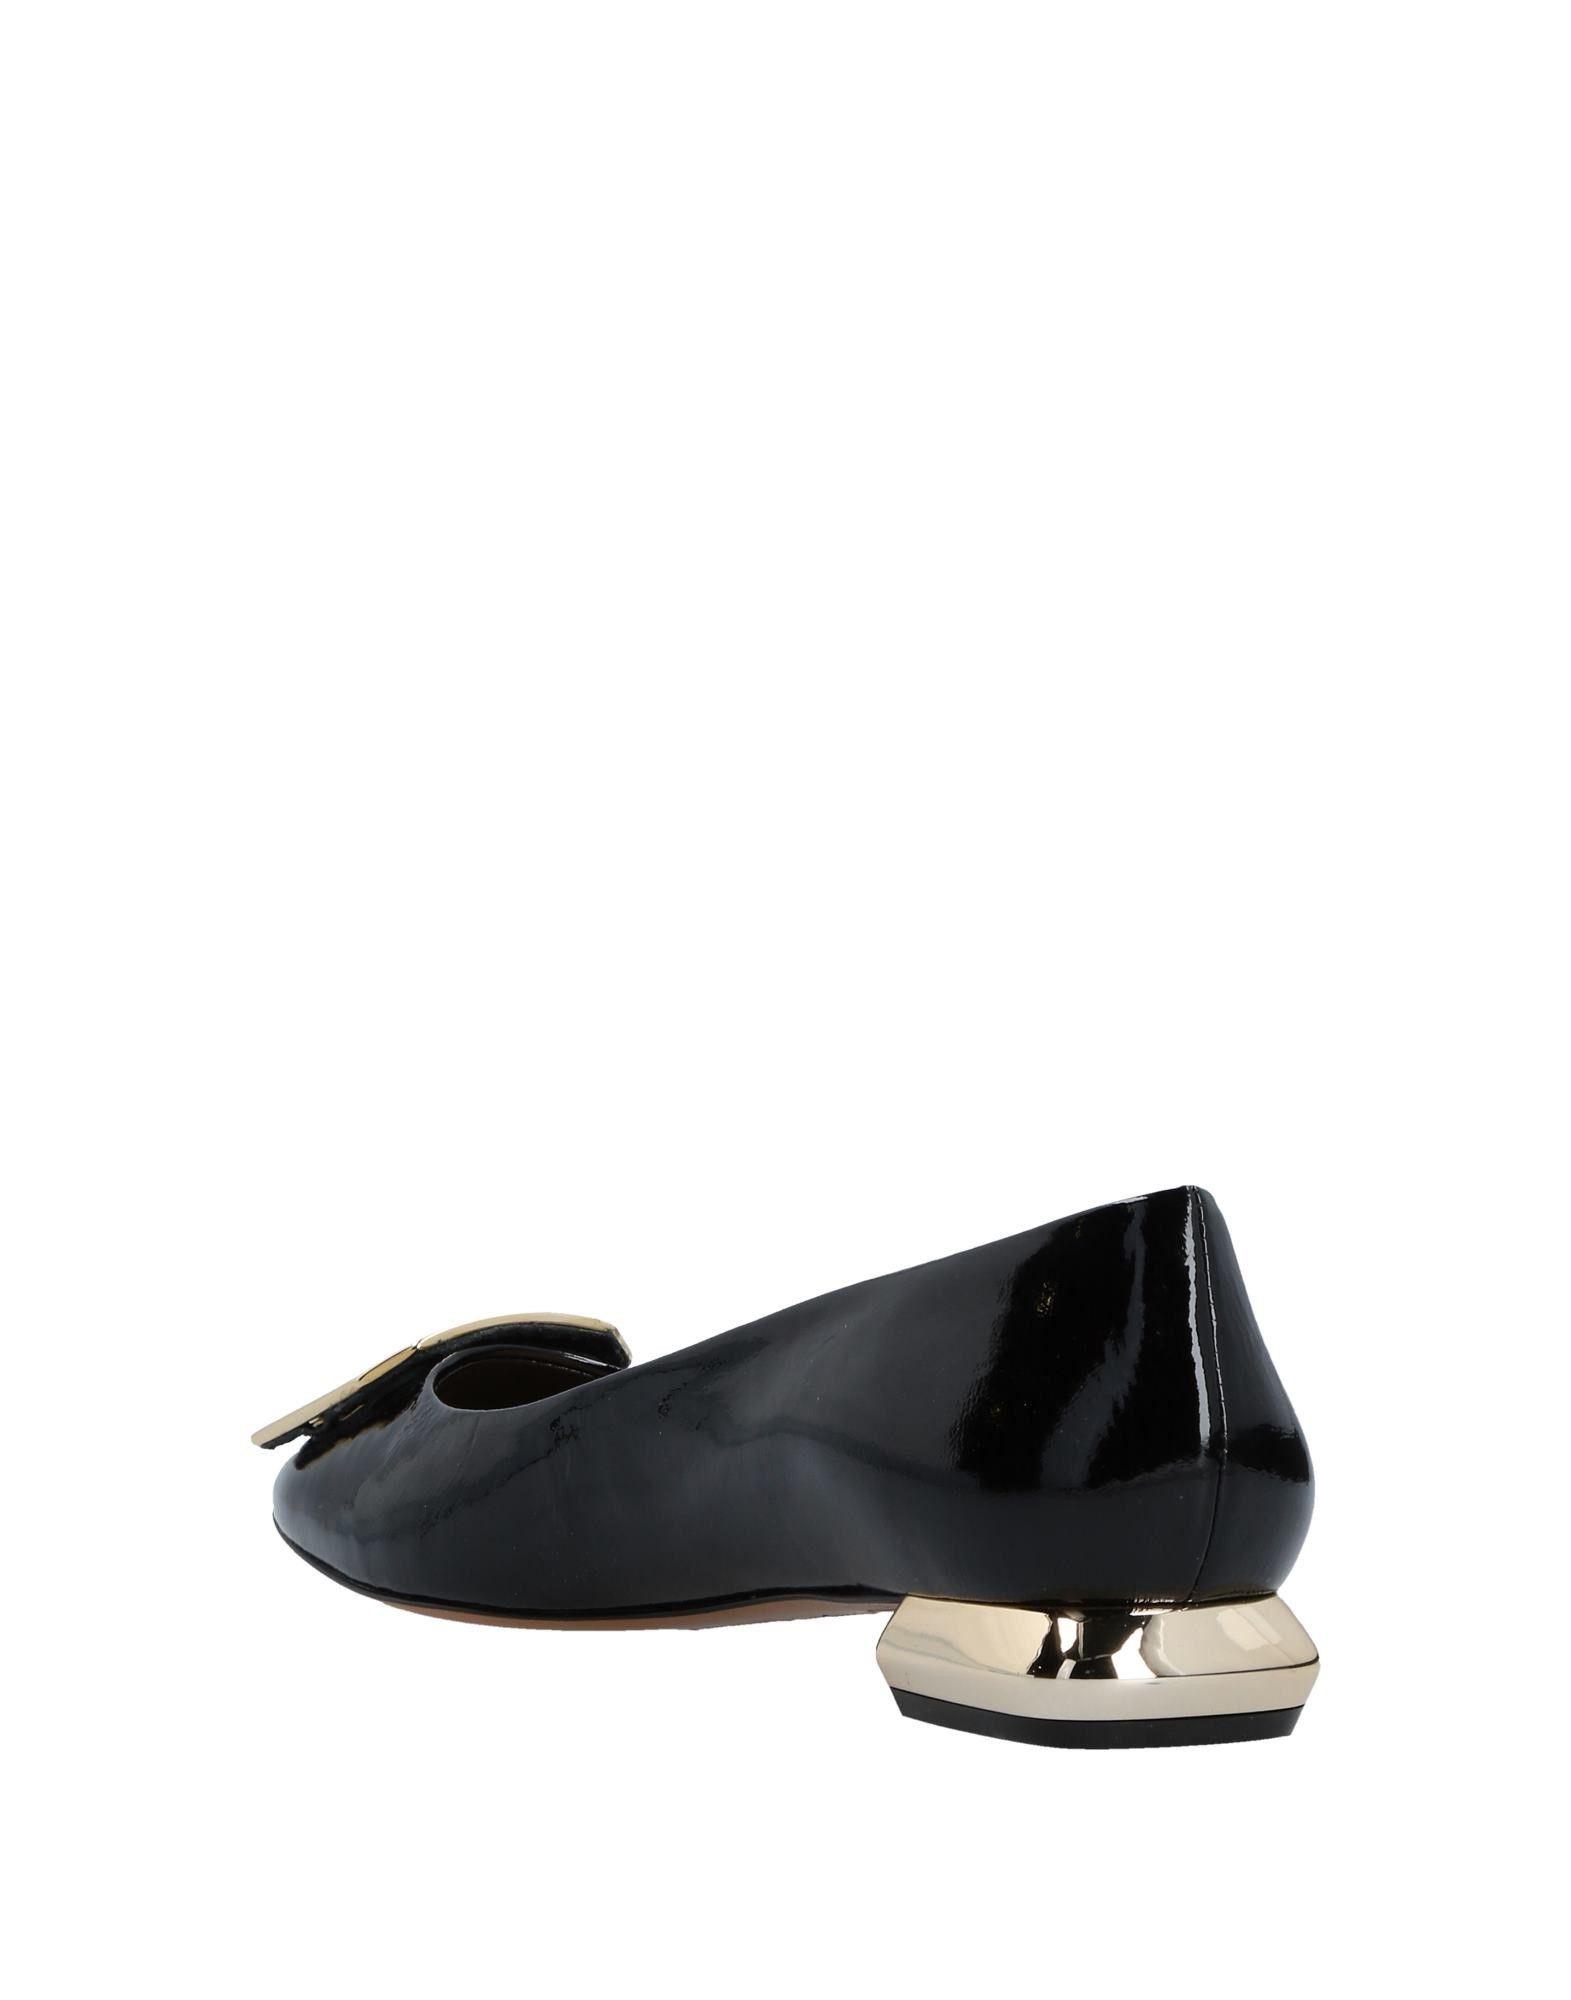 Fabio Rusconi Gute Ballerinas Damen  11532251QM Gute Rusconi Qualität beliebte Schuhe 815fde